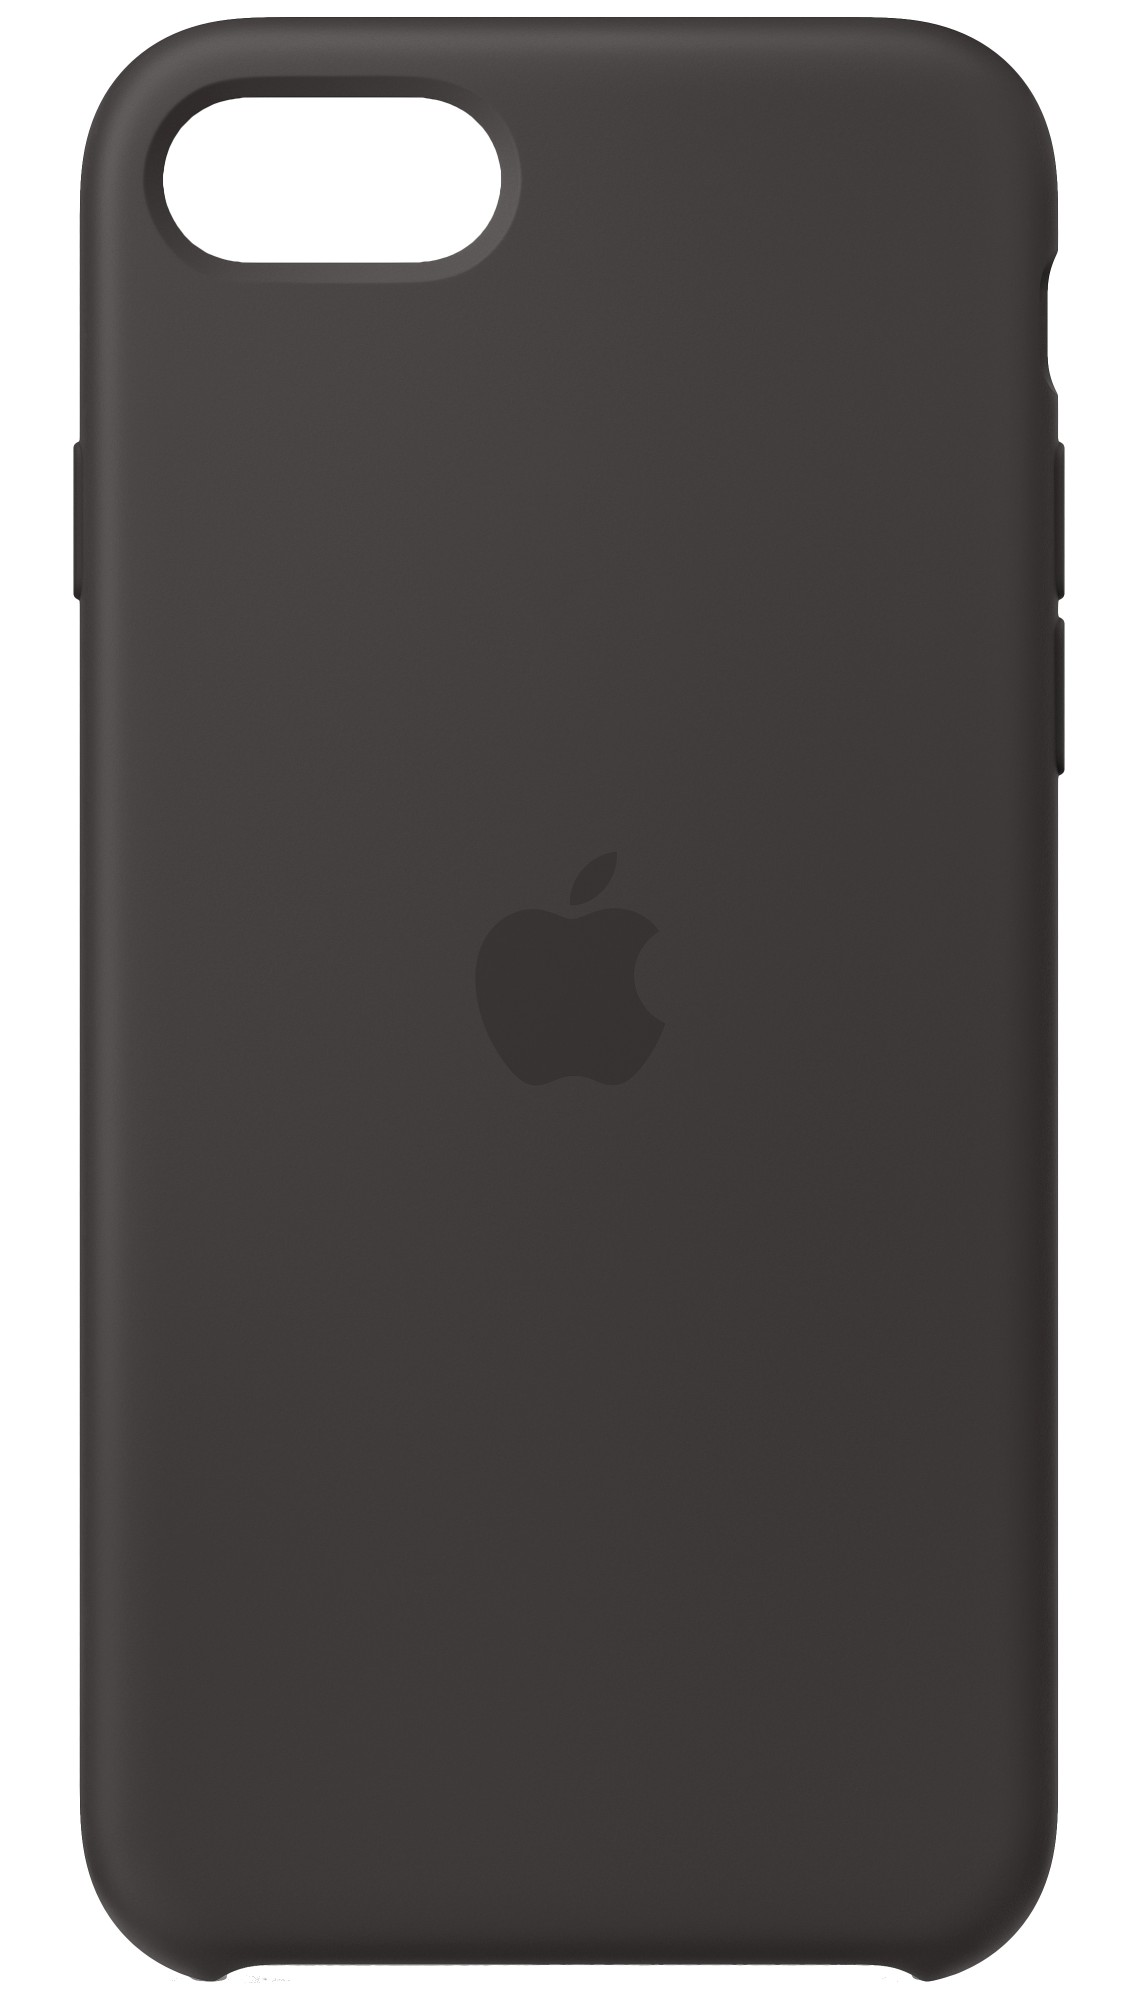 "Apple MXYH2ZM/A?ES funda para teléfono móvil 11,9 cm (4.7"") Negro"